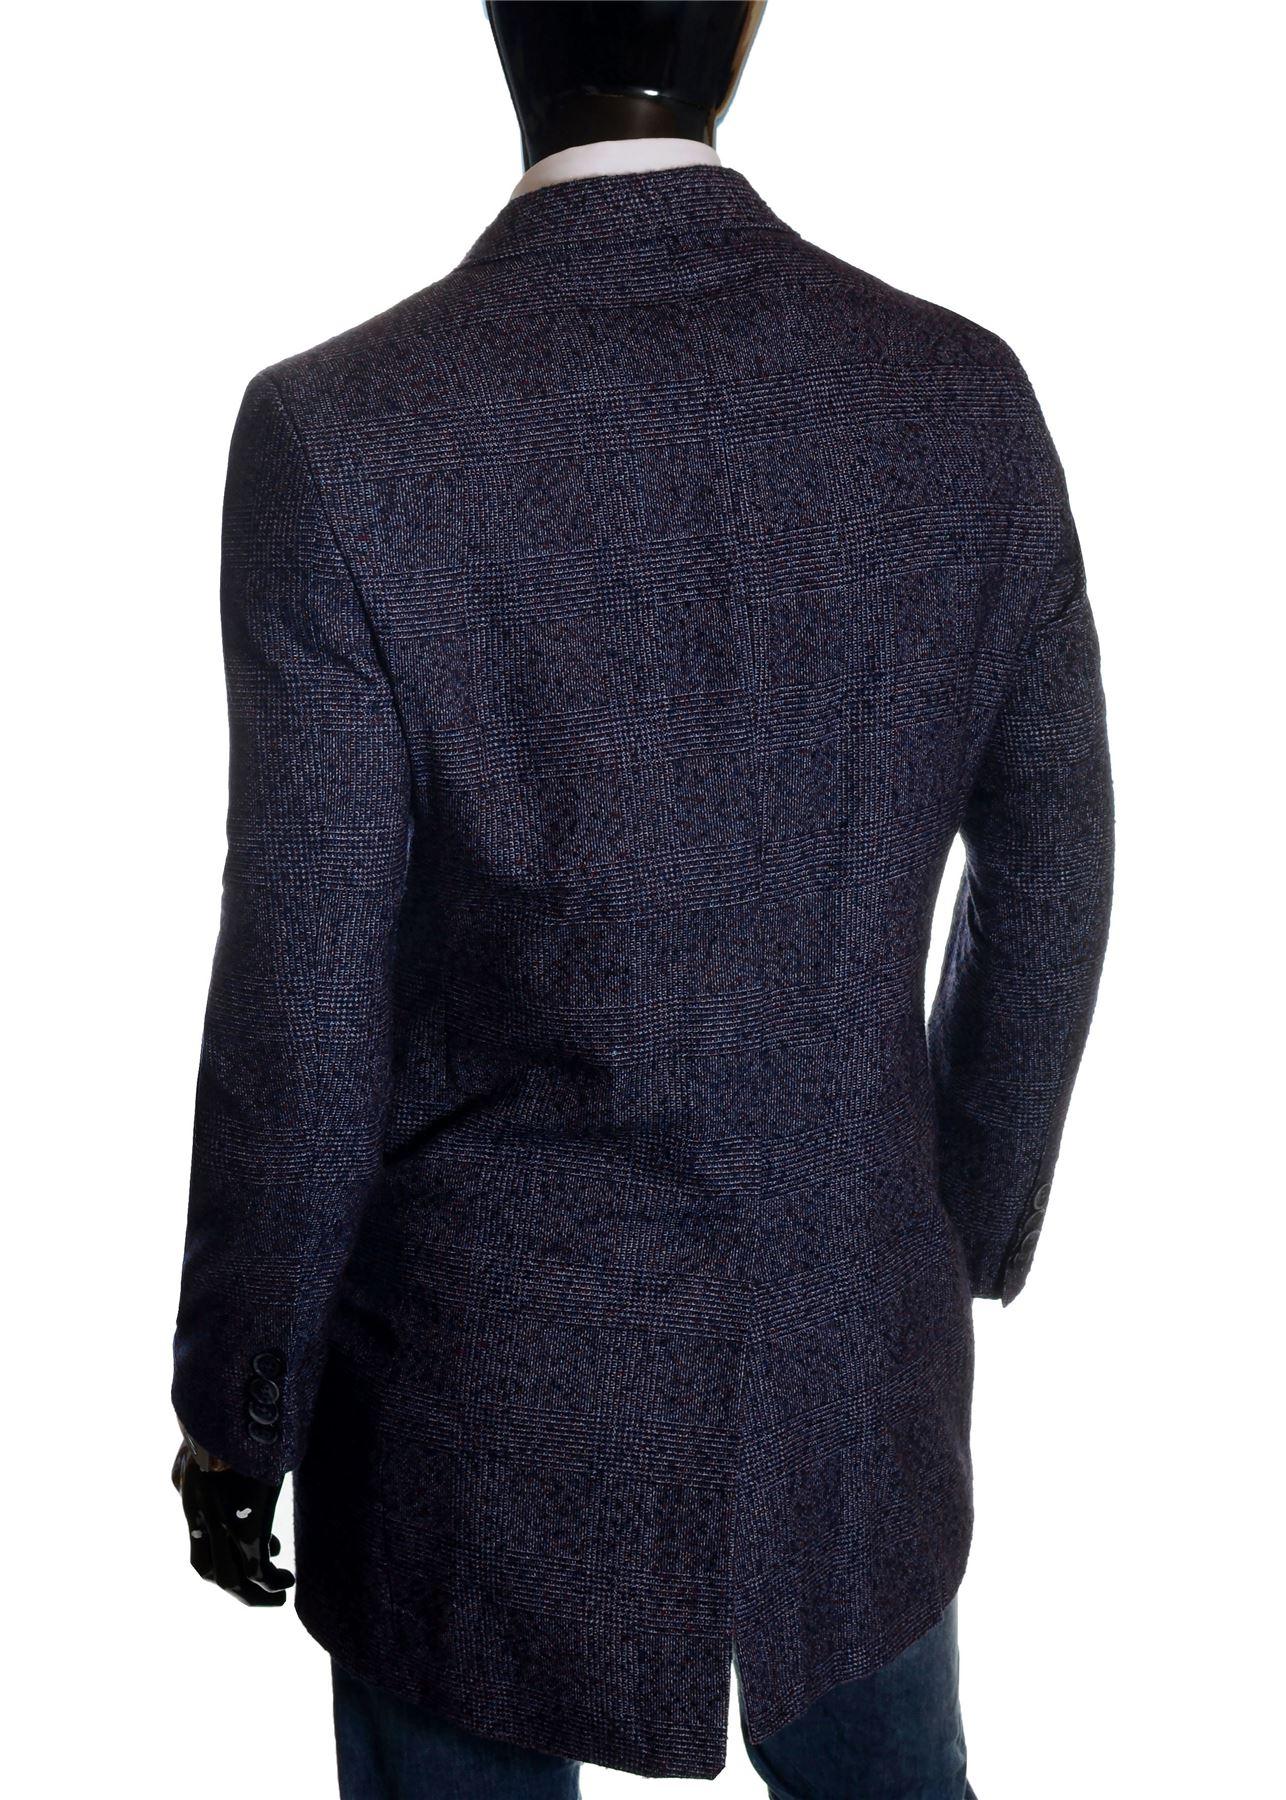 Men-039-s-Checkered-Coat-3-4-Long-Tweed-Cashmere-Wool-Trendy-Formal-Winter-Overcoat thumbnail 22